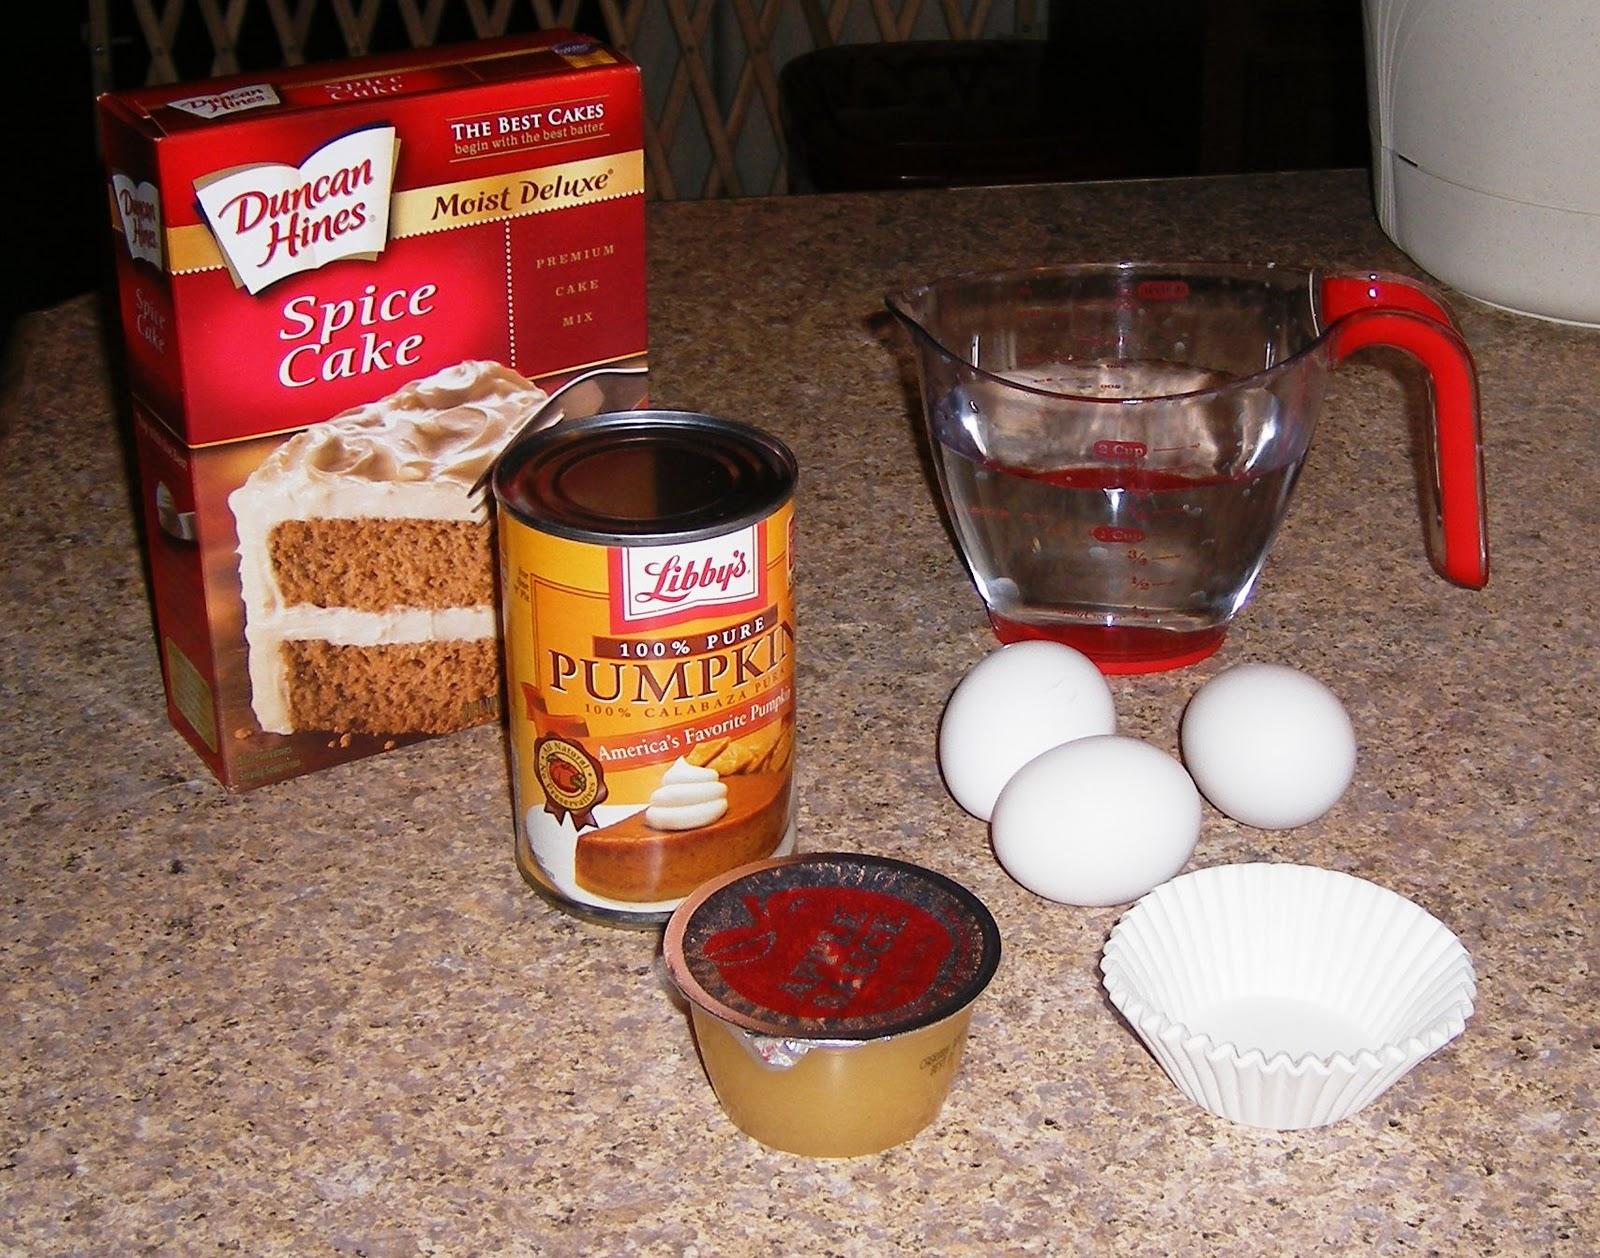 Substituting Pumpkin Cake Mix